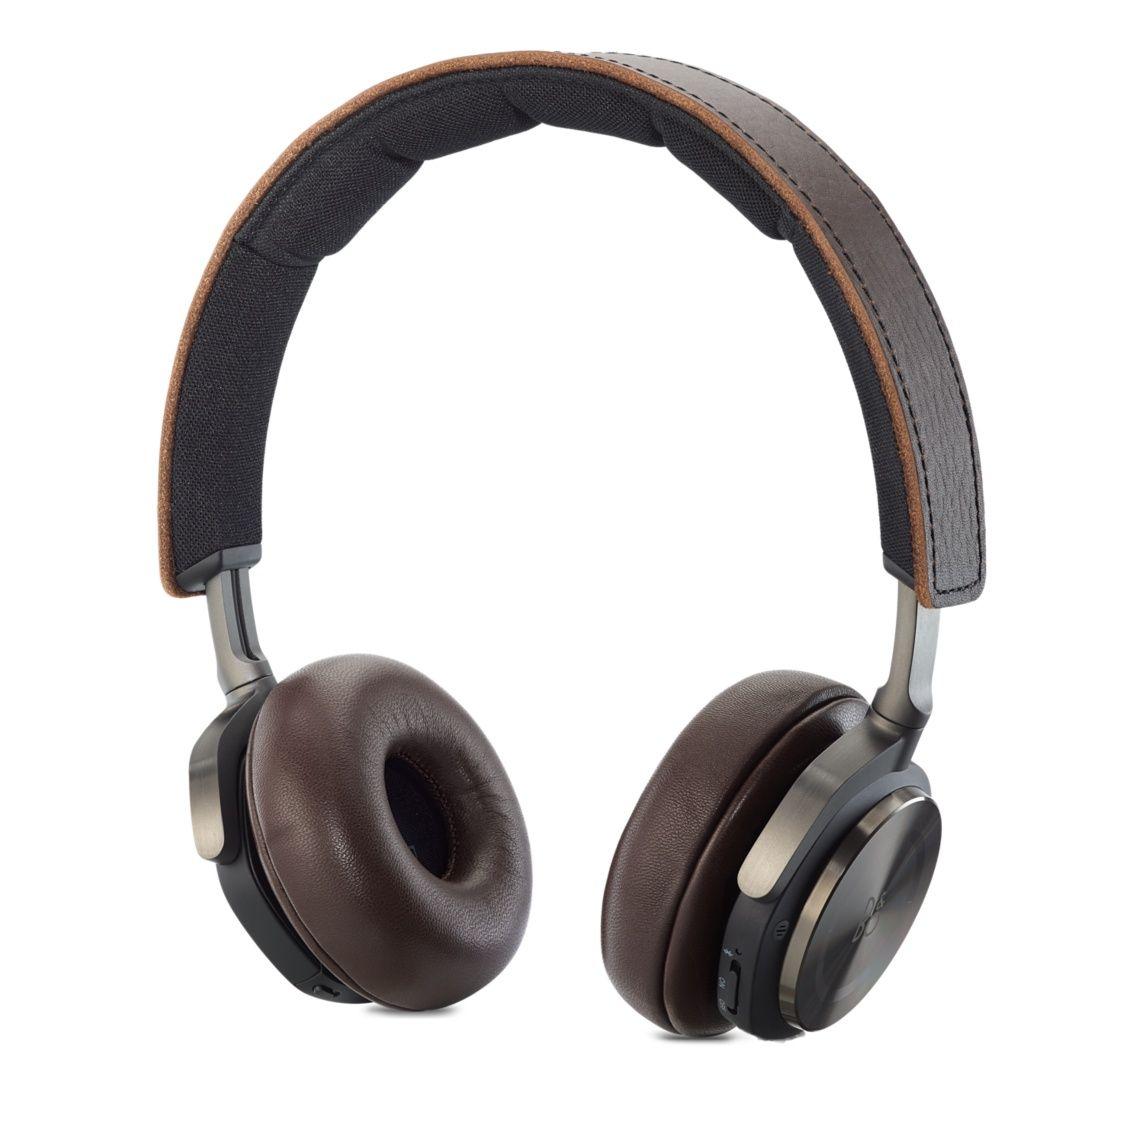 B&O PLAY BeoPlay H8 Wireless On-Ear Headphones - Apple (NZ